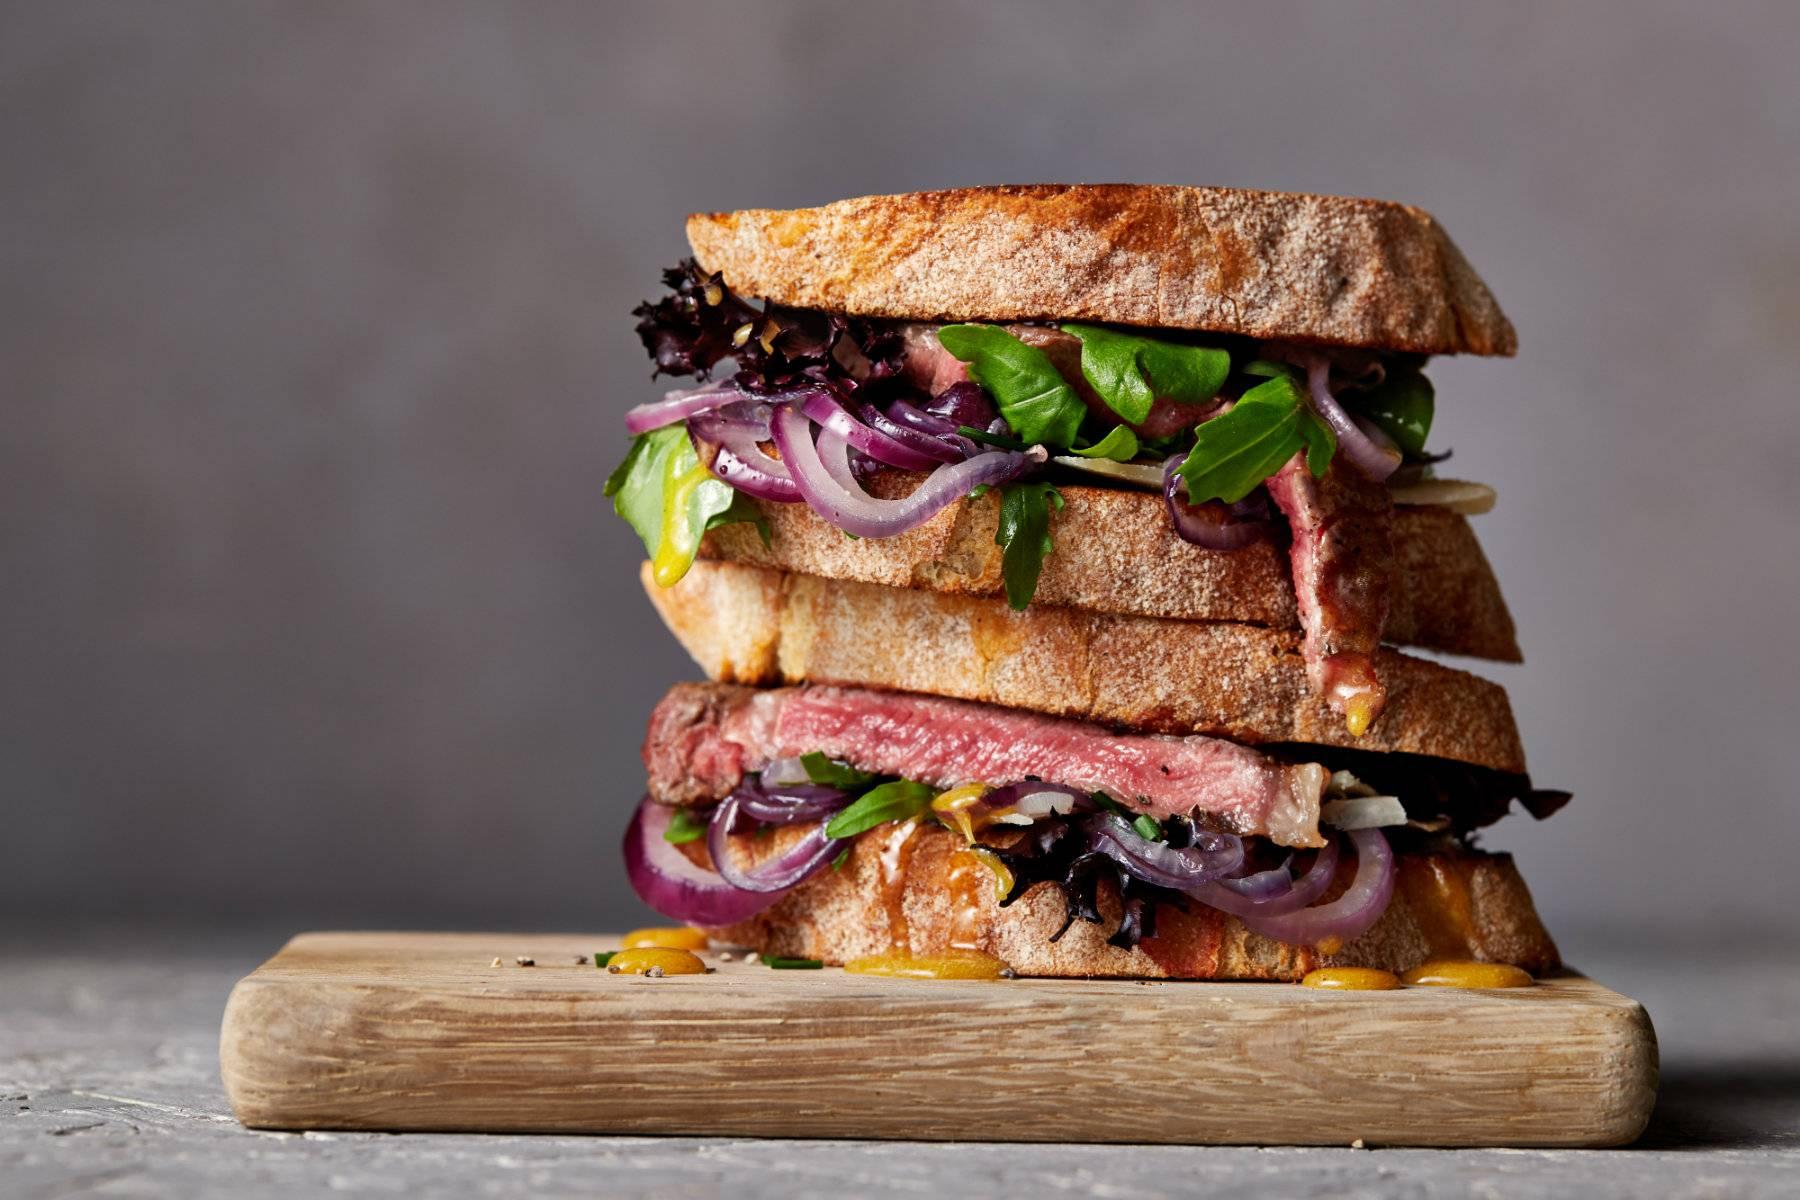 5 gesunde Sandwich Rezepte | Belegte Brötchen Deluxe